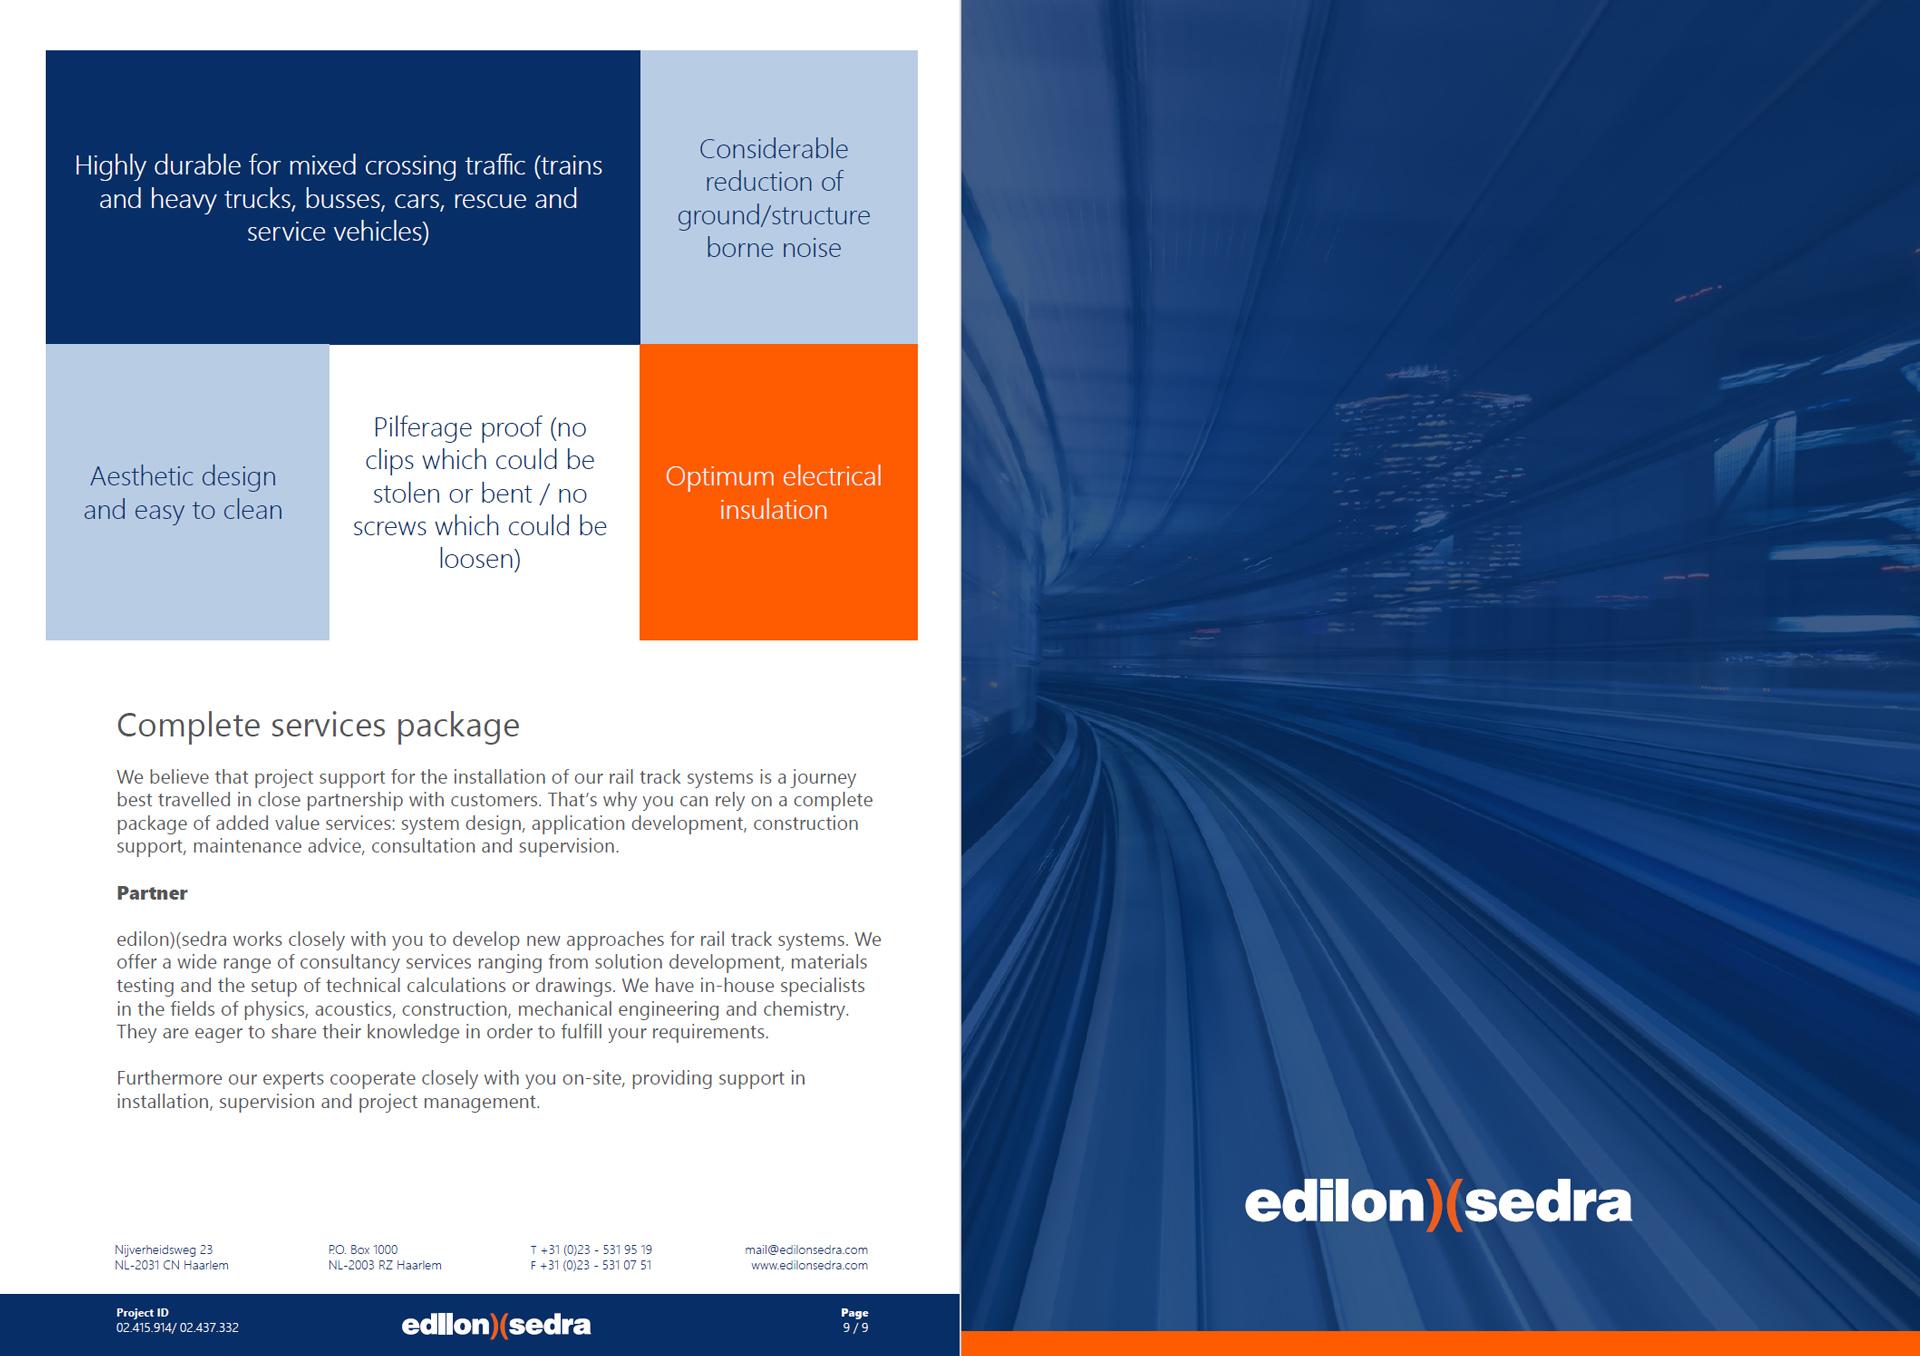 edilon)(sedra word templates